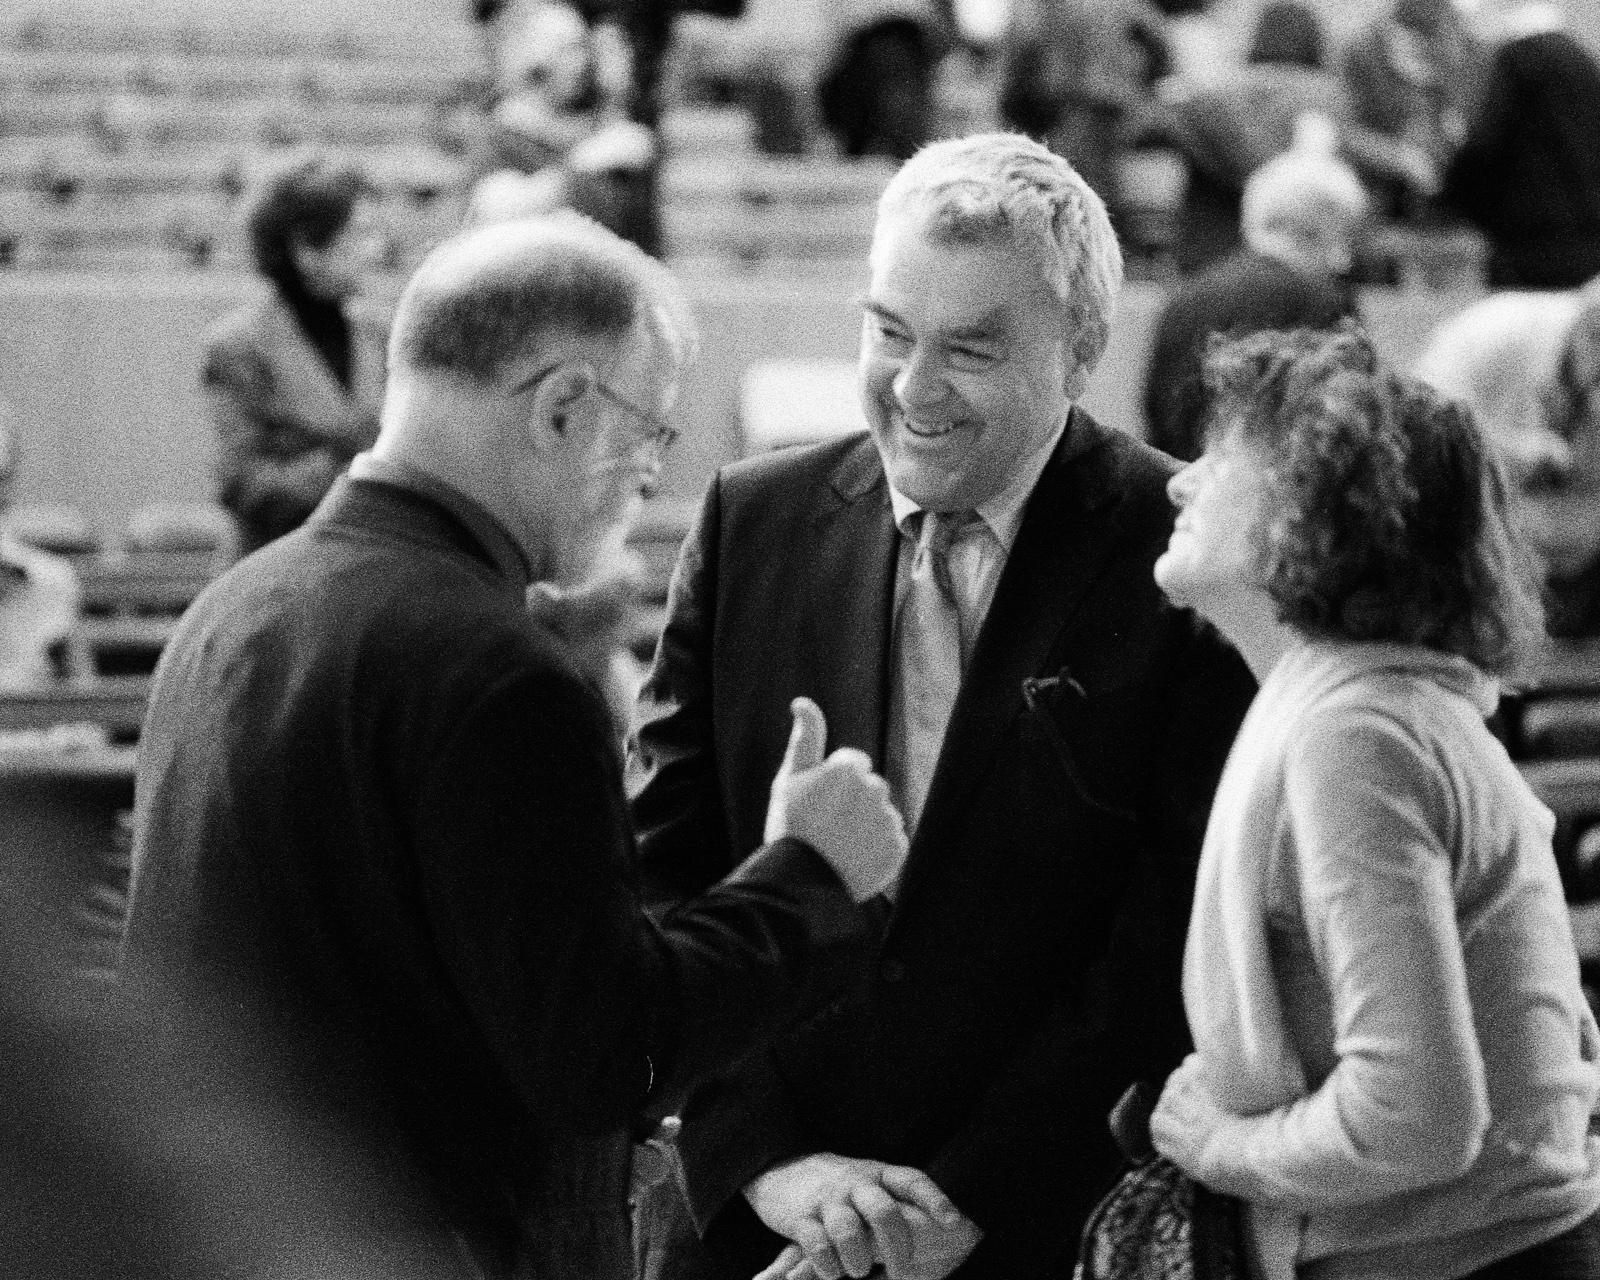 Rencontres internationales de Genève 2017 - Résister, écrire, imaginer - Alberto Manguel, Michel Porret, Patrizia Lombardo